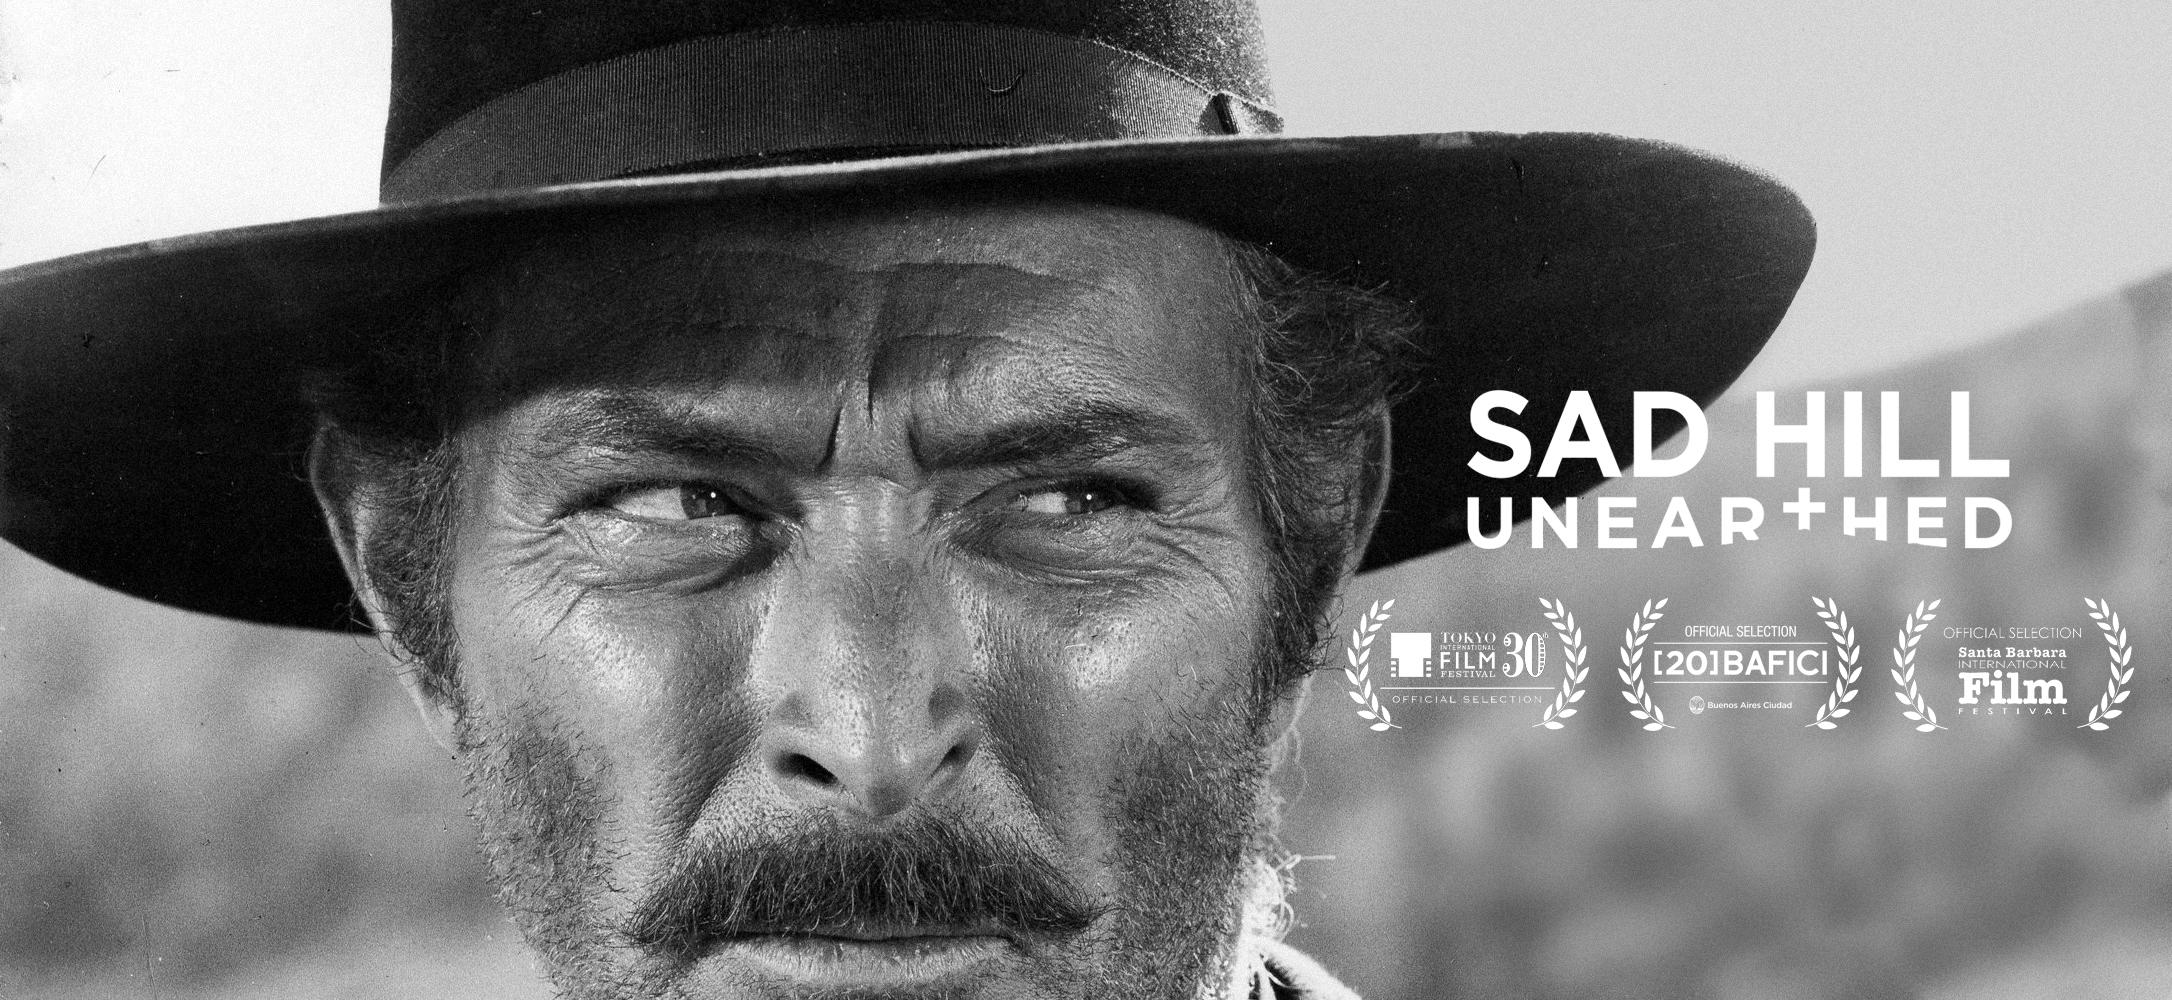 Lee Van Cleef en Sad Hill Unearthed (Desenterrando Sad Hill) de Guillermo de Oliveira